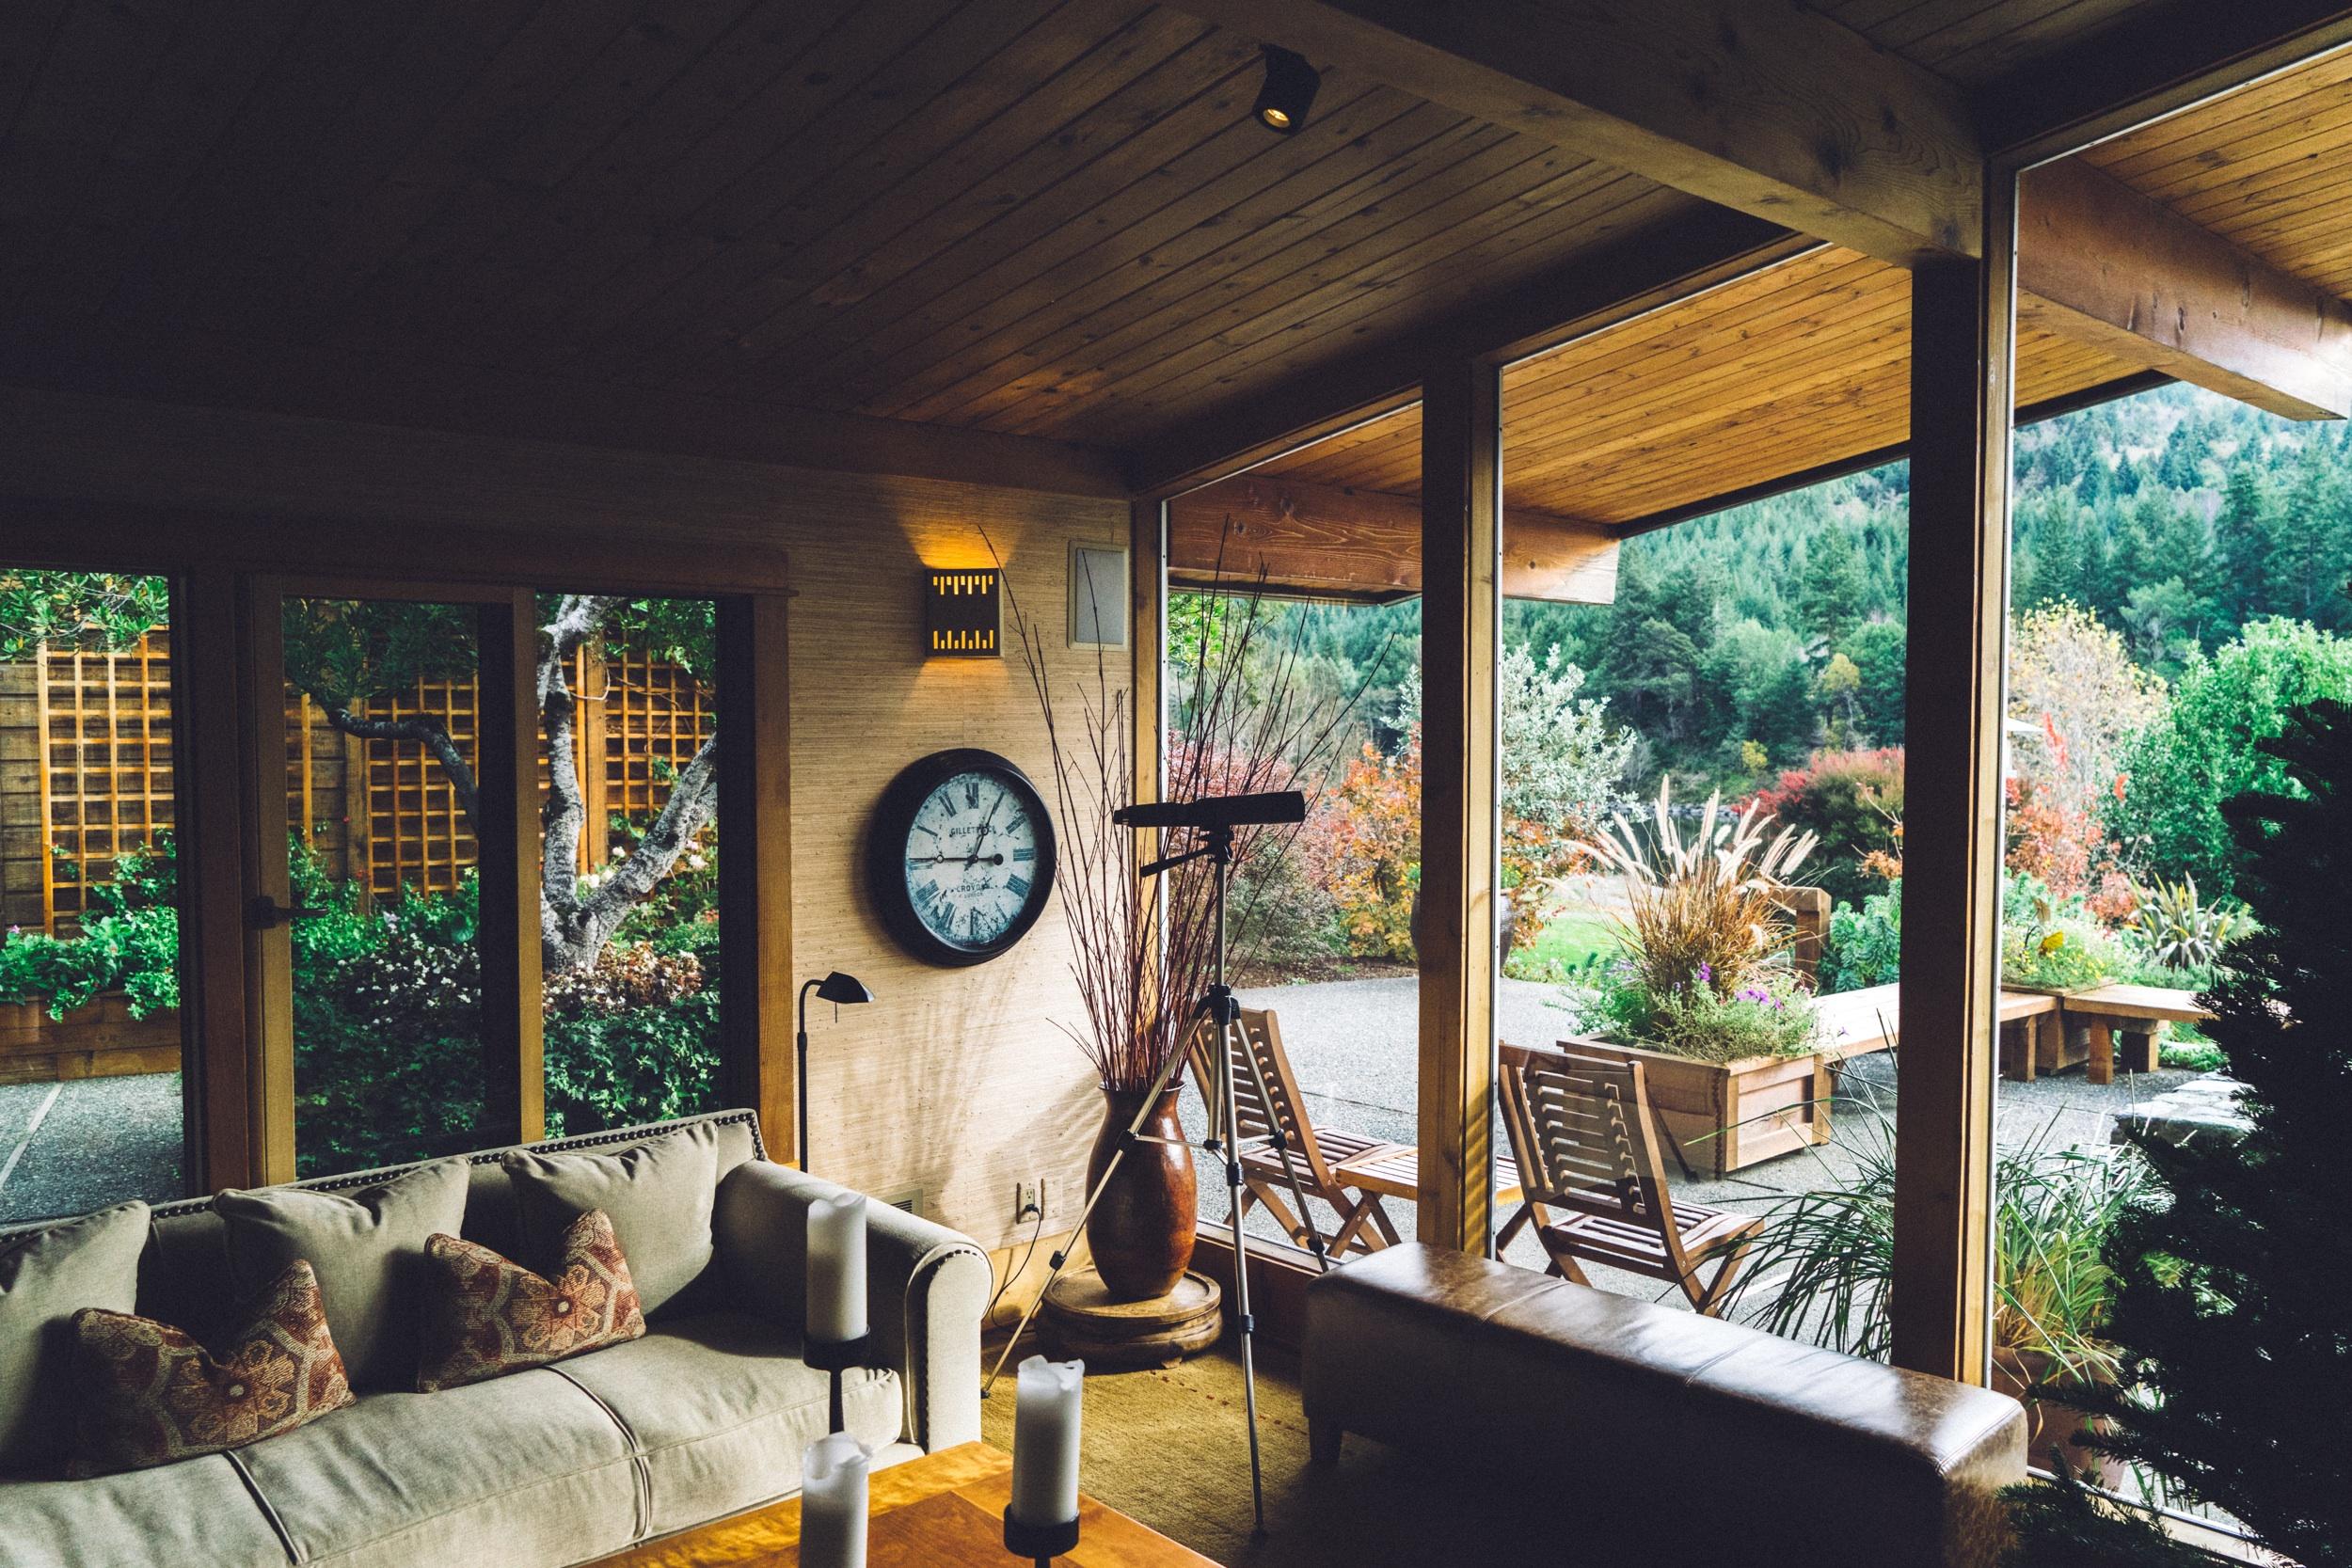 Architecture Wood Villa House Interior Window Restaurant Home Porch Cottage Indoor Backyard Property Living Room